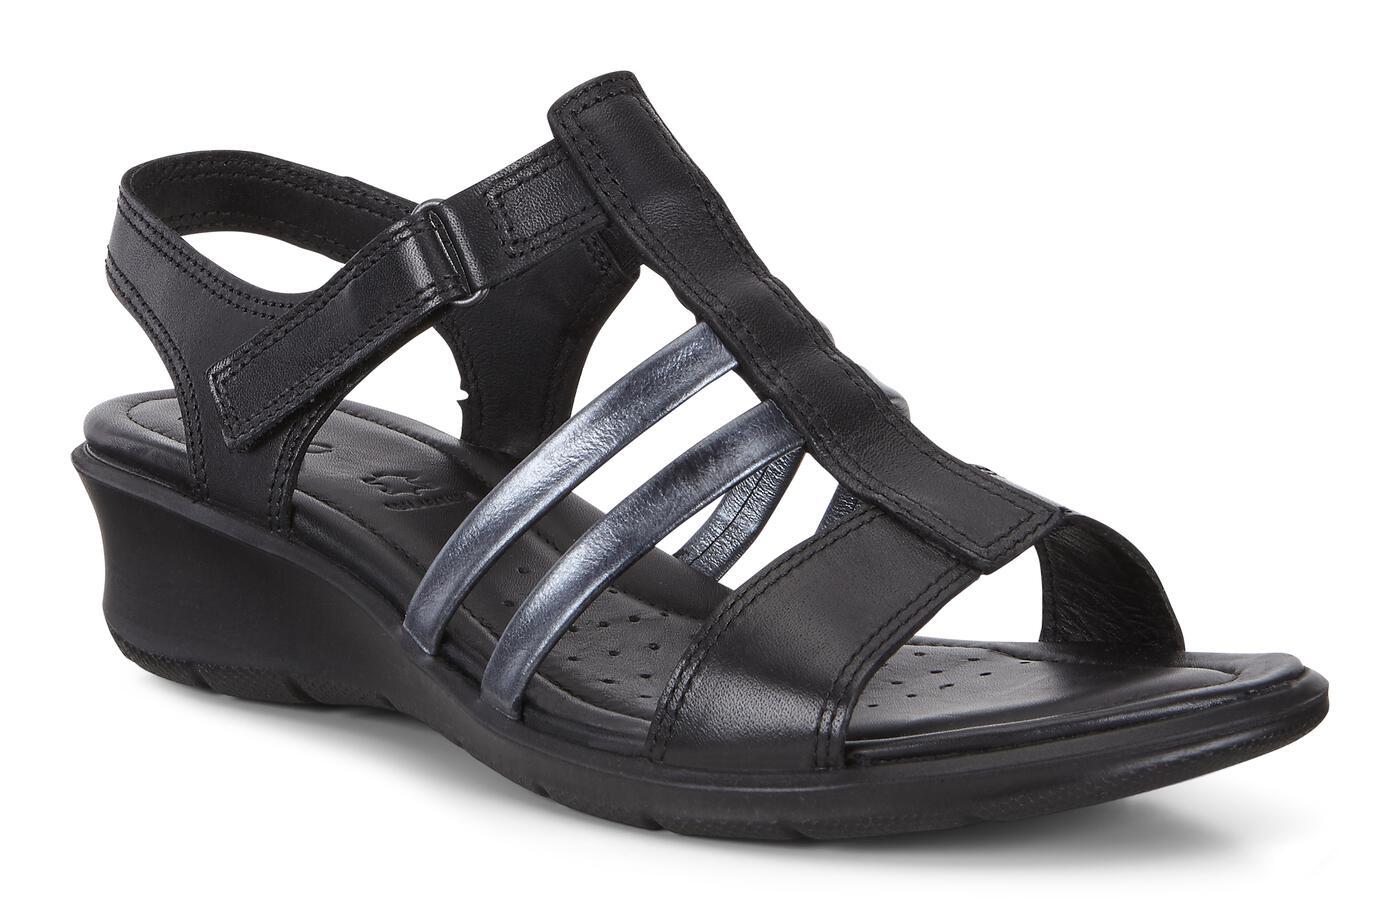 ECCO Felicia Ankle Sandal